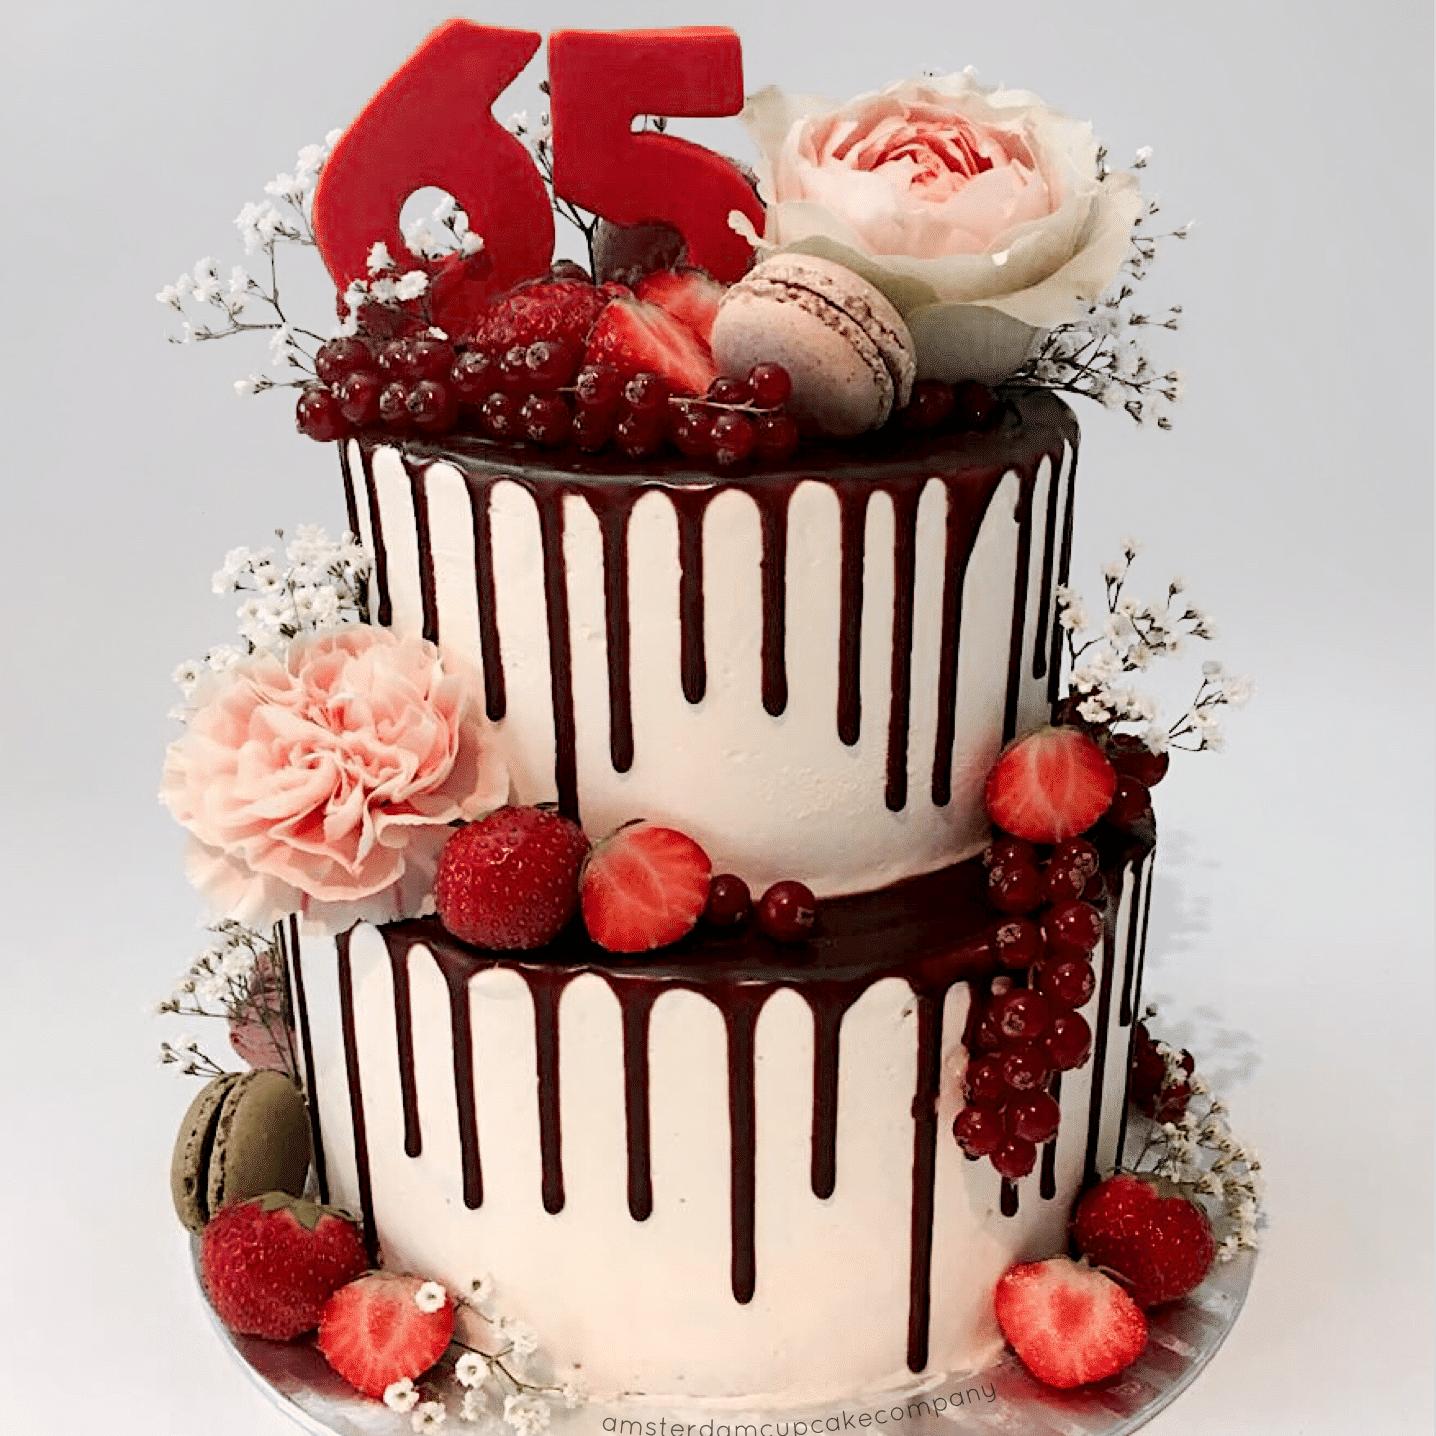 Drip cakes, Cakes, cakes amsterdam, cake shop amsterdam, cupcake winkel amsterdam, taart amsterdam kopen, red velvet amsterdam, red velvet kopen, birthday cake amsterdam, verjaardagstaart amsterdam, red velvet cake, red velvet taart, american red velvet amsterdam, red velvet cake amsterdam, red velvet cake bestellen, wedding cake, bruidstaart, thema taart, theme cake, customized cake, corporate cake, big cake amsterdam, grote taart bestelling, stapeltaart bestellen, gender reveal cake amsterdam, gender reveal taart amsterdam, birthdayparty cake, kinderfeestje traktatie, , online taarten winkel, online taarten kopen, online taarten bestellen, webshop cakes, order cakes online, bakery amsterdam, amsterdam bakkerij, american bakery amsterdam, Drip cake amsterdam, dripcake amsterdam, driptaart amsterdam, driptaart amsterdam, dripping cake amsterdam, dripping taart amsterdam, red velvet taart amsterdam, grote taart amsterdam, stapeltaart amsterdam, grote taart kopen, grote taart bestellen, dripcake bestellen, drip cake bestellen, dripping cake order, dripping cake shop, verjaardags driptaart, birthday dripcake, babyshower drip cake, babyshower dripping cake, wedding drip cake, bruiloft driptaart, bruids driptaart, corporate dripping cake, zakelijke driptaart